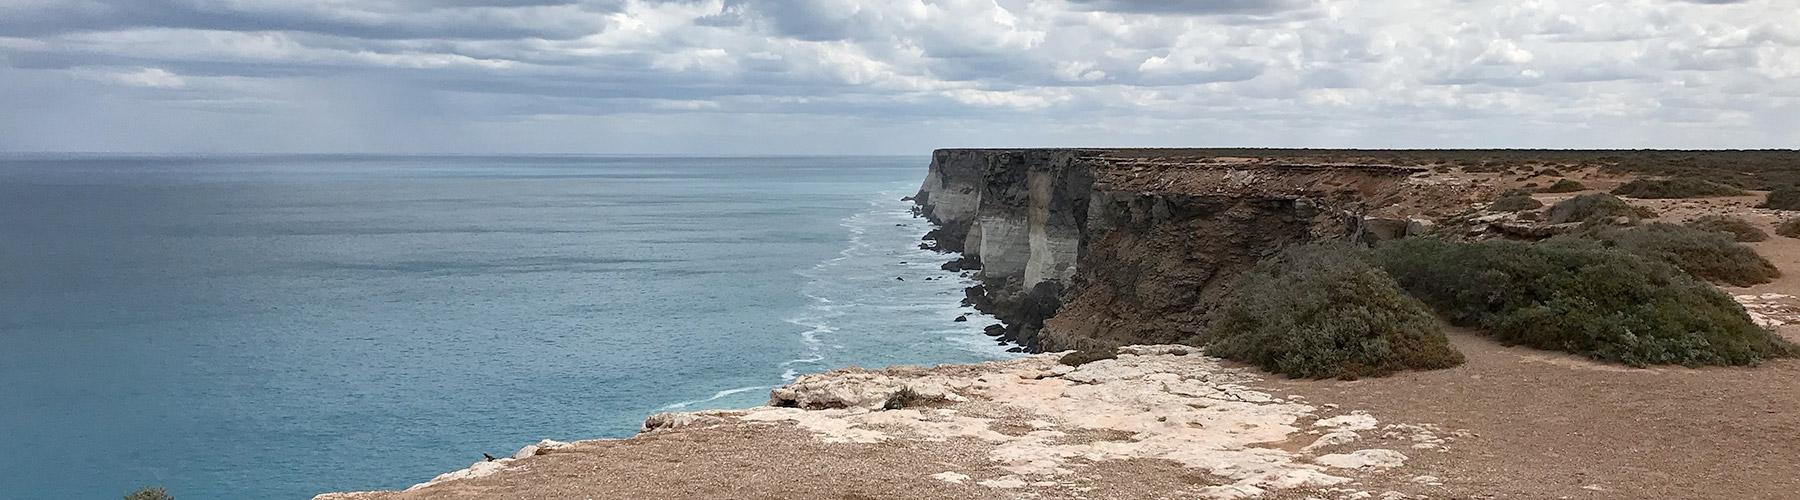 Coffs Harbour cliffs